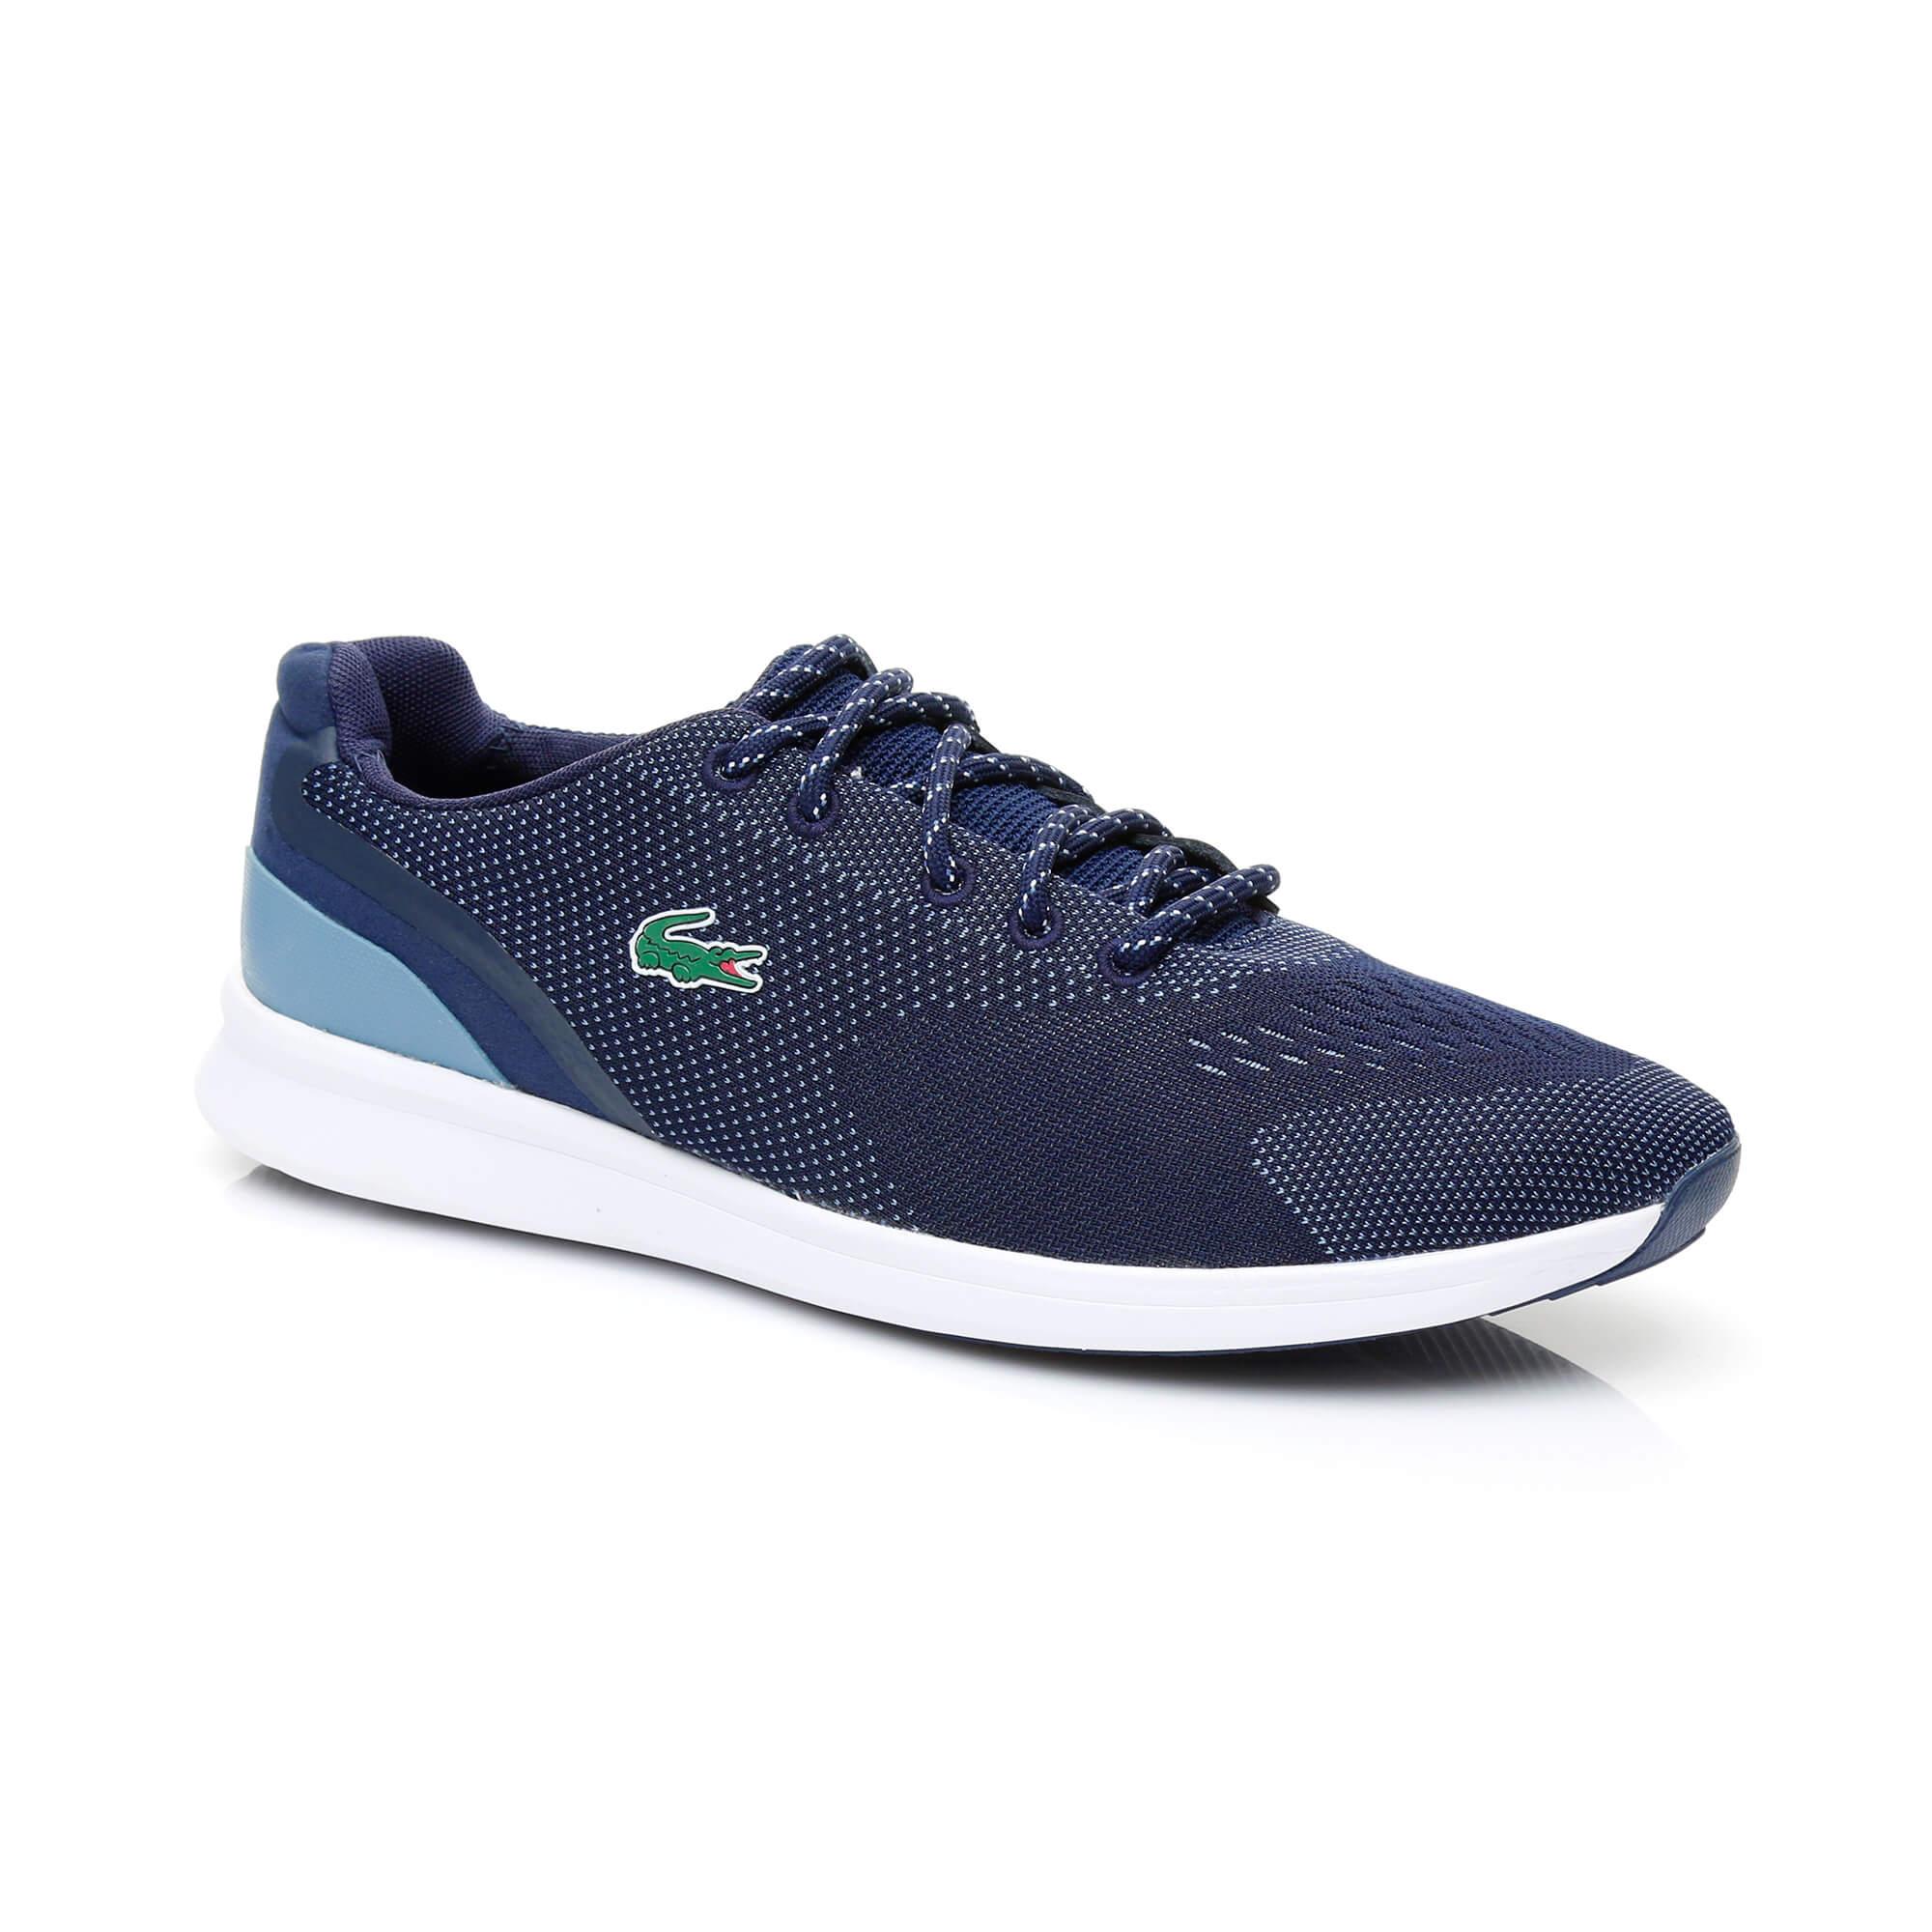 мужские кроссовки lacoste, синие